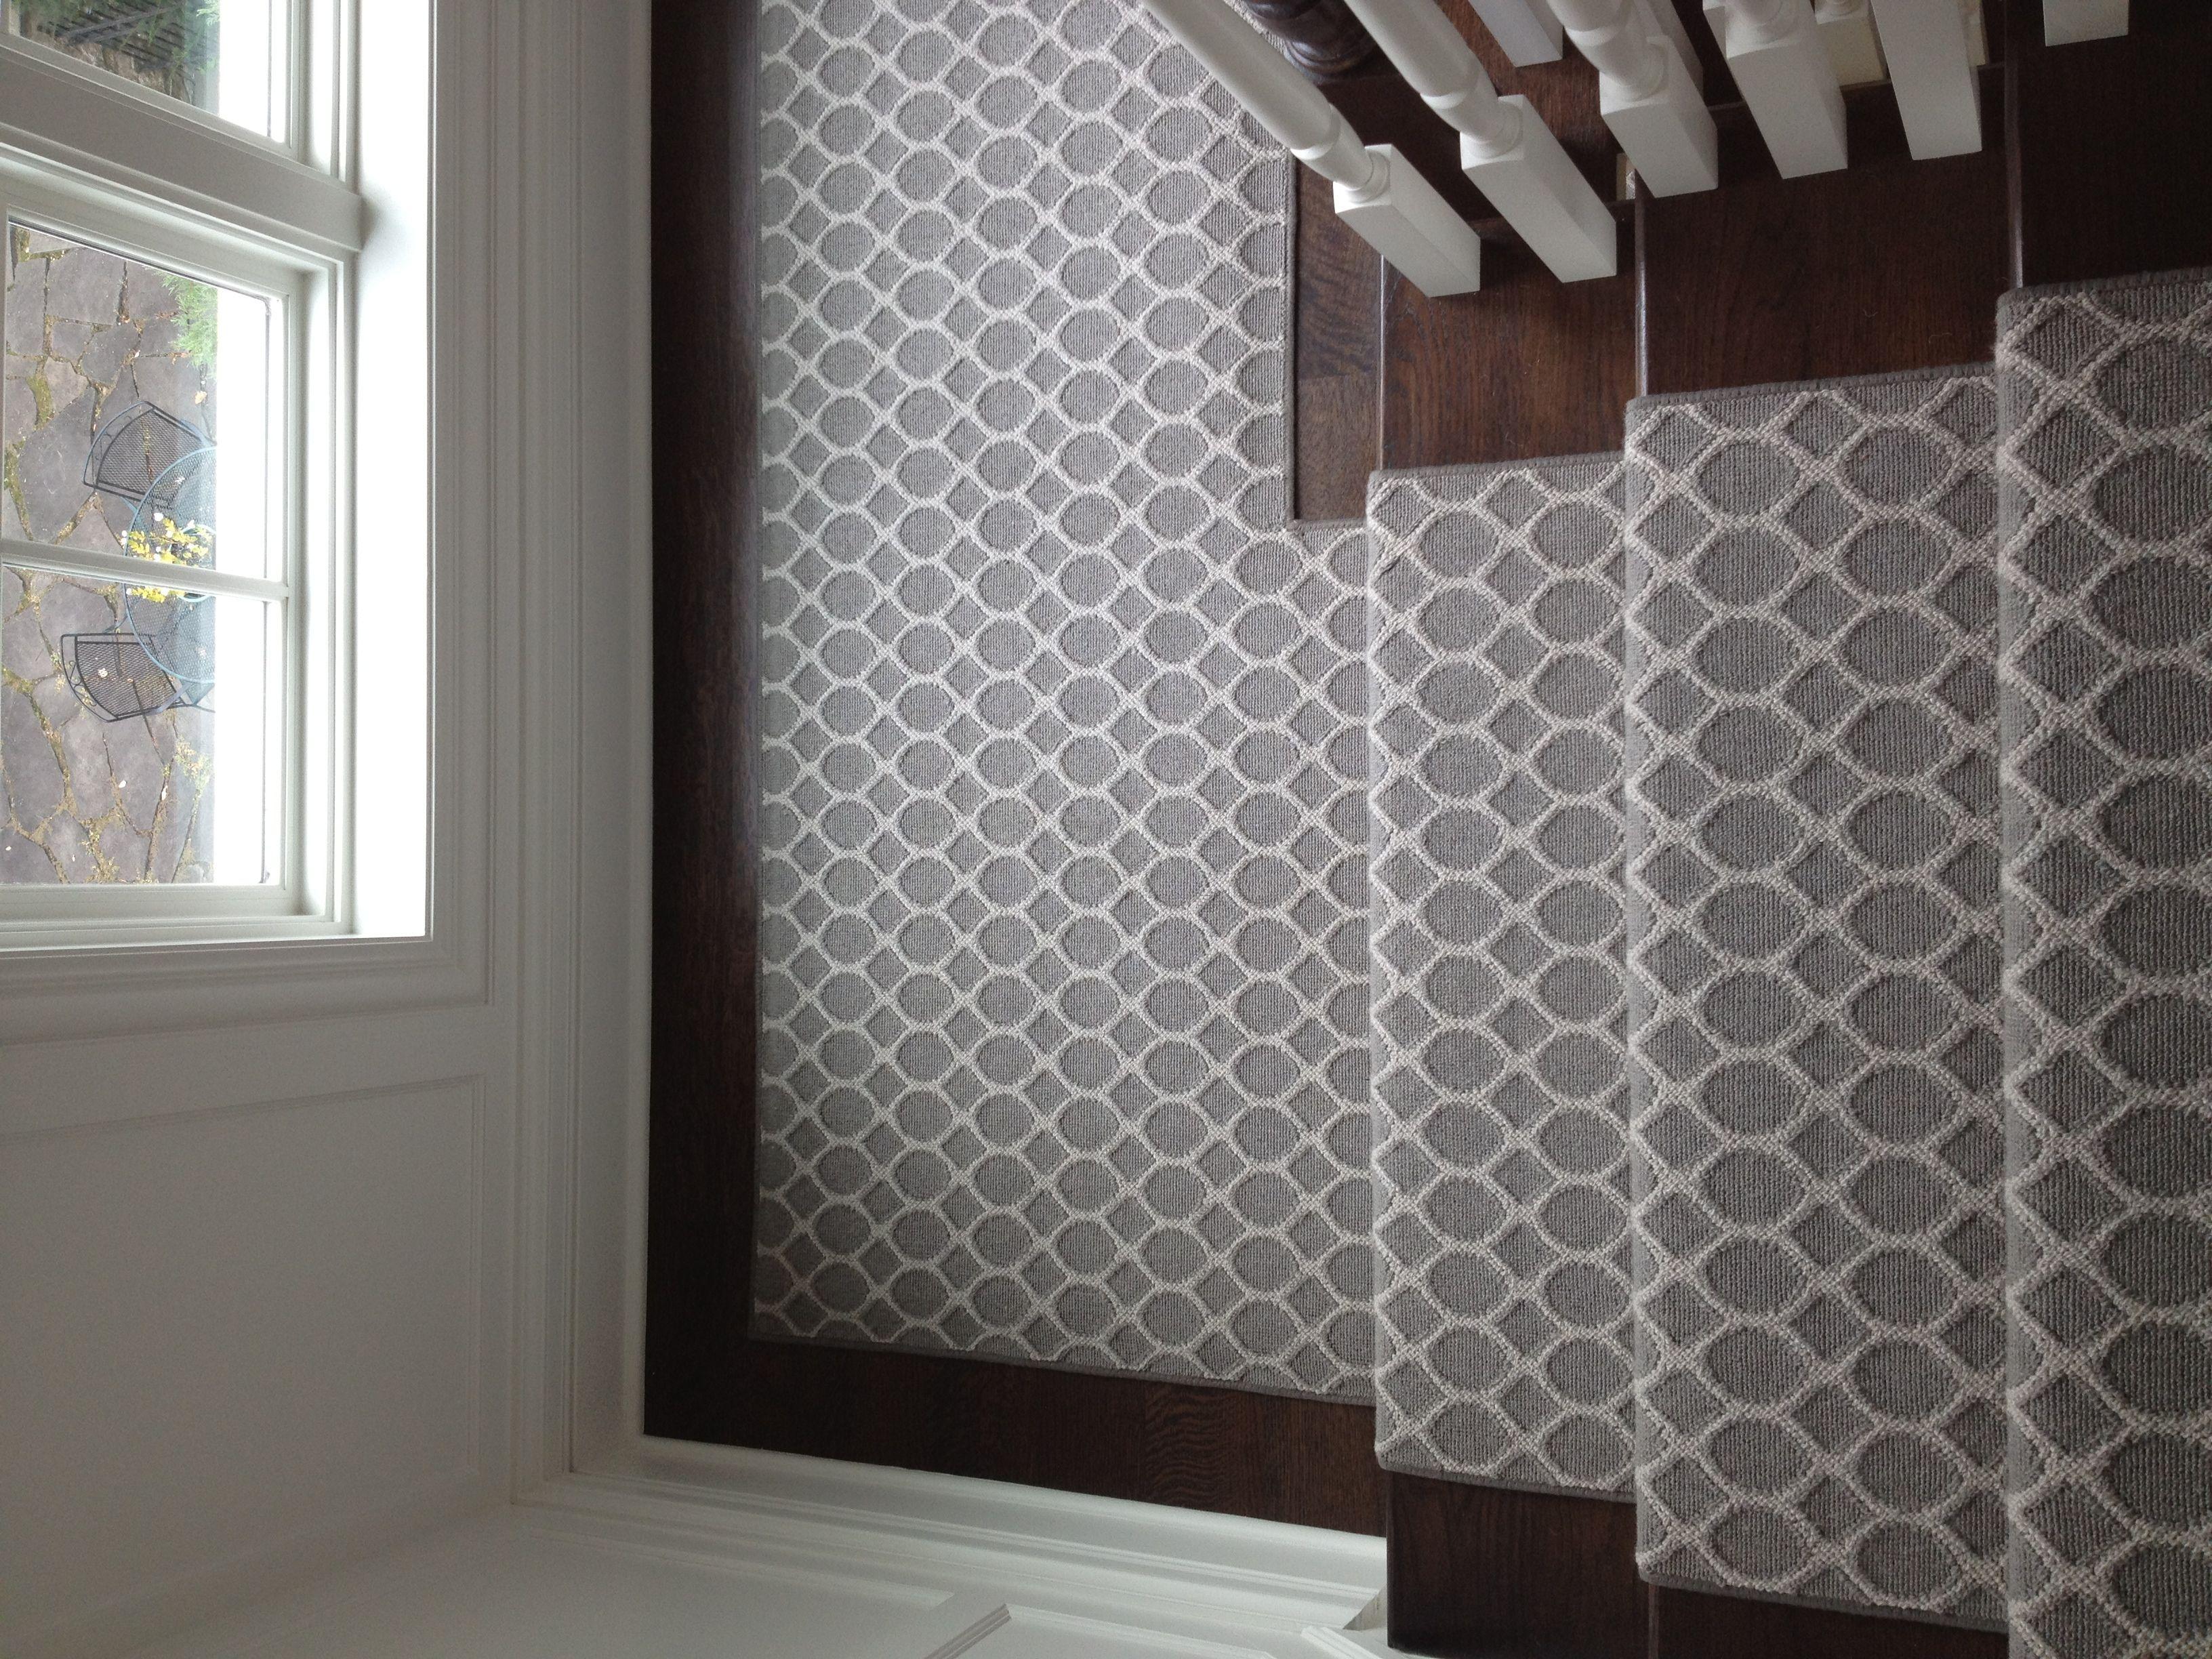 carpet runner up stairs